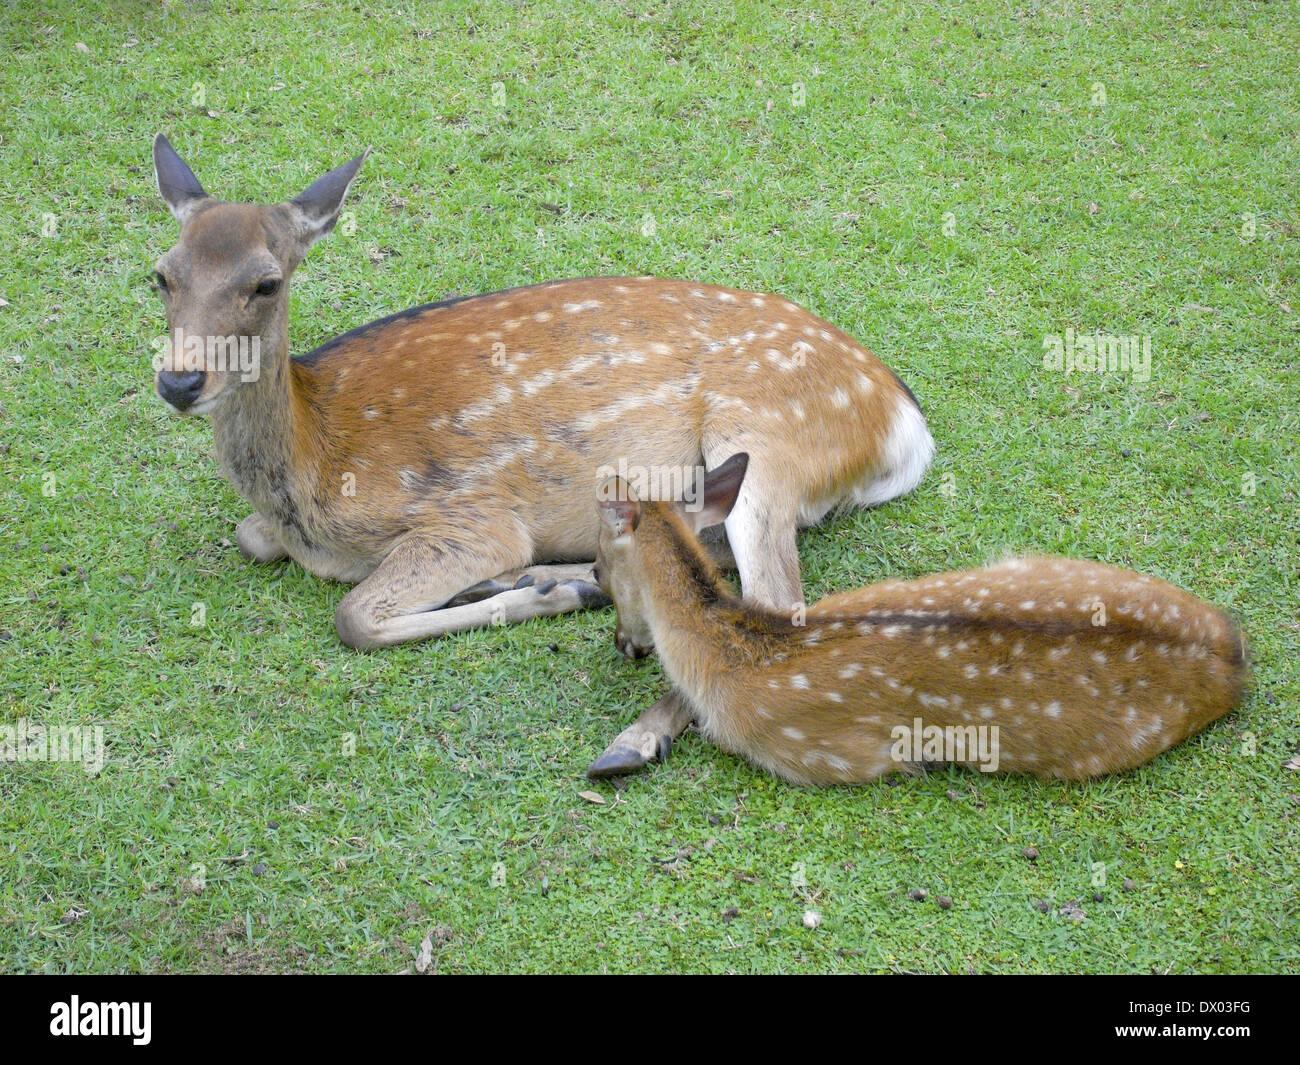 Deer and fawn, Nara Prefecture, Japan - Stock Image